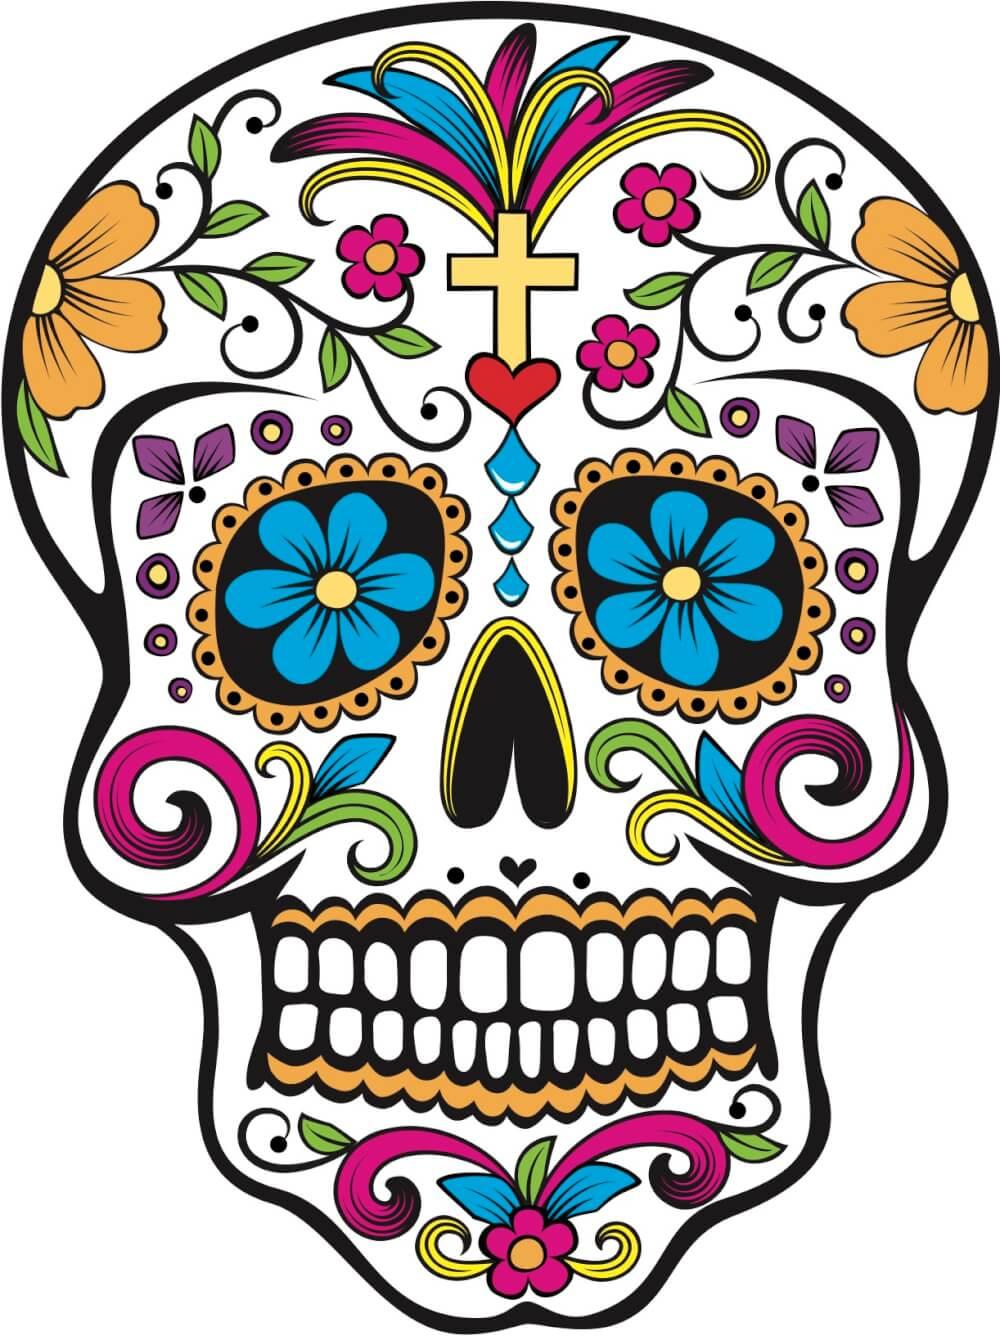 dia de los muertos sugar skull diy footprint painting activity for